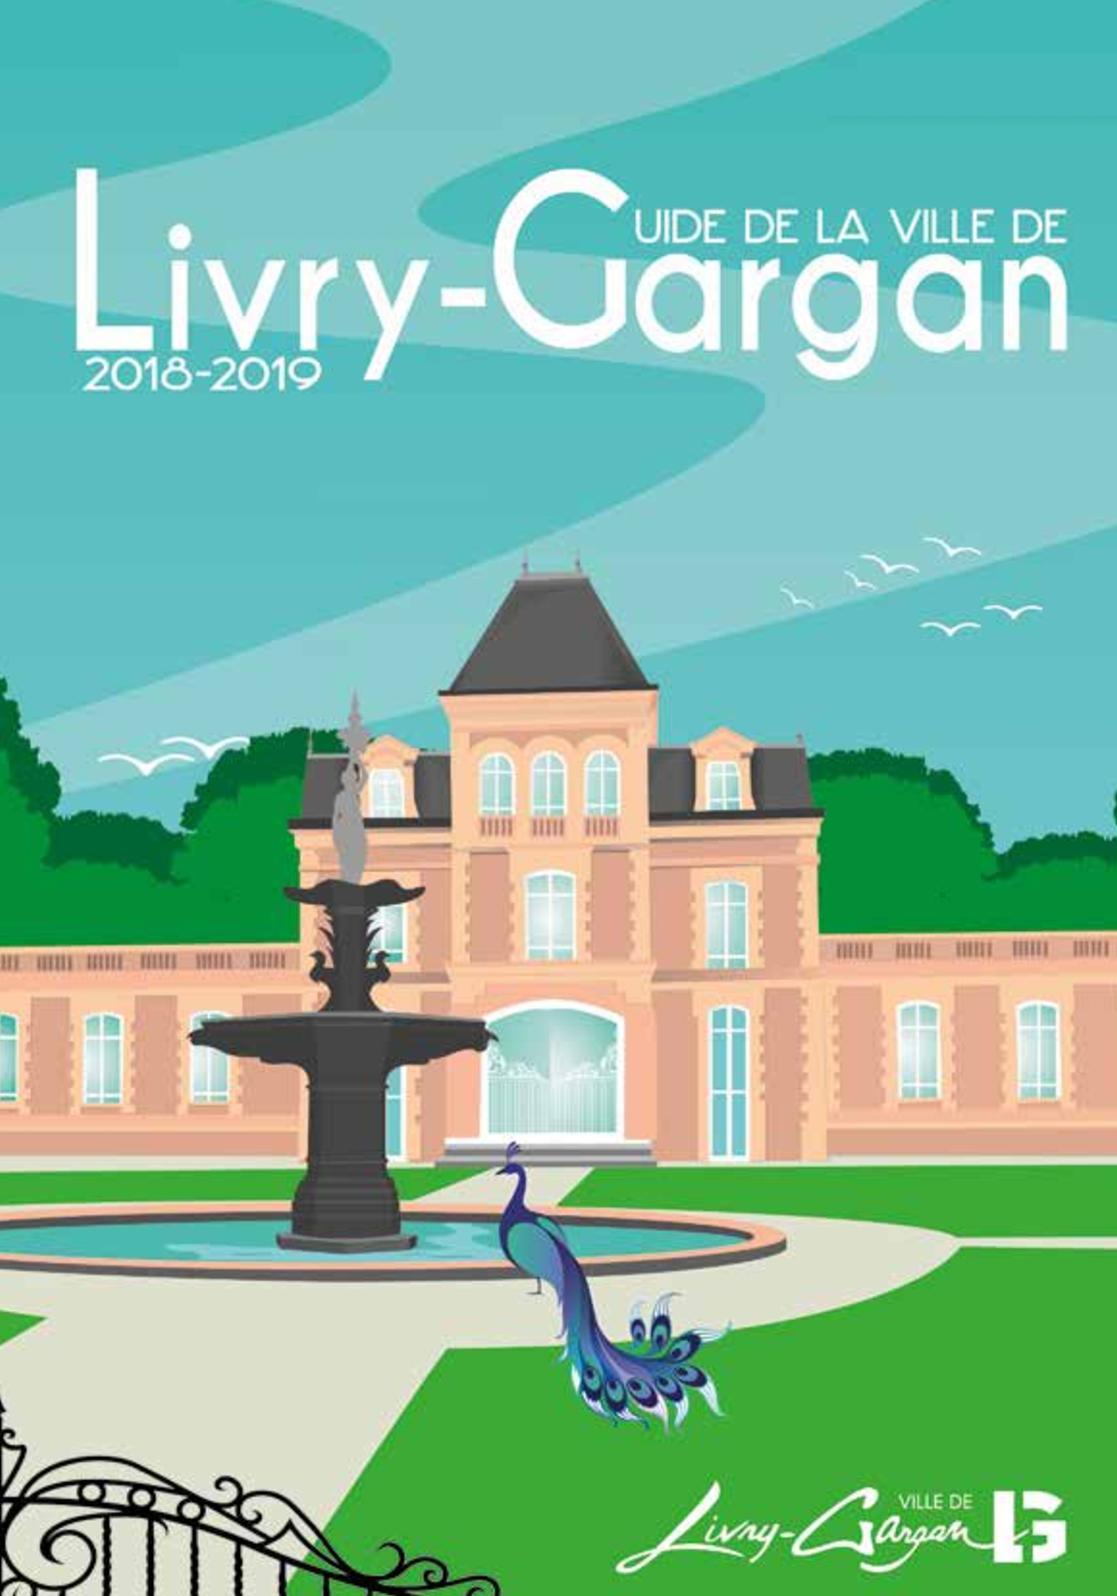 recherche rencontre gay parents a Livry-Gargan